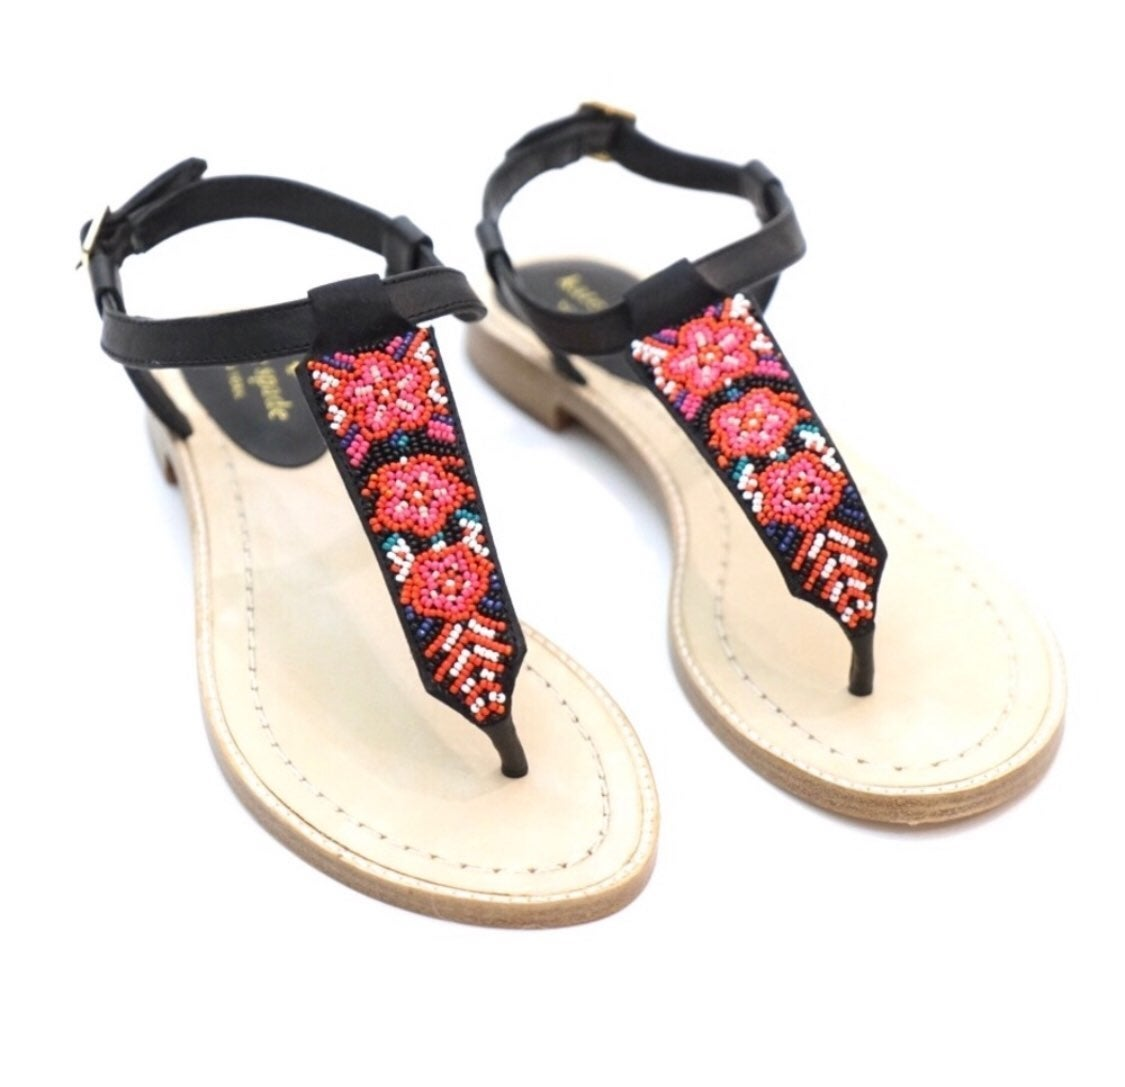 Kate Spade Beaded Sandals